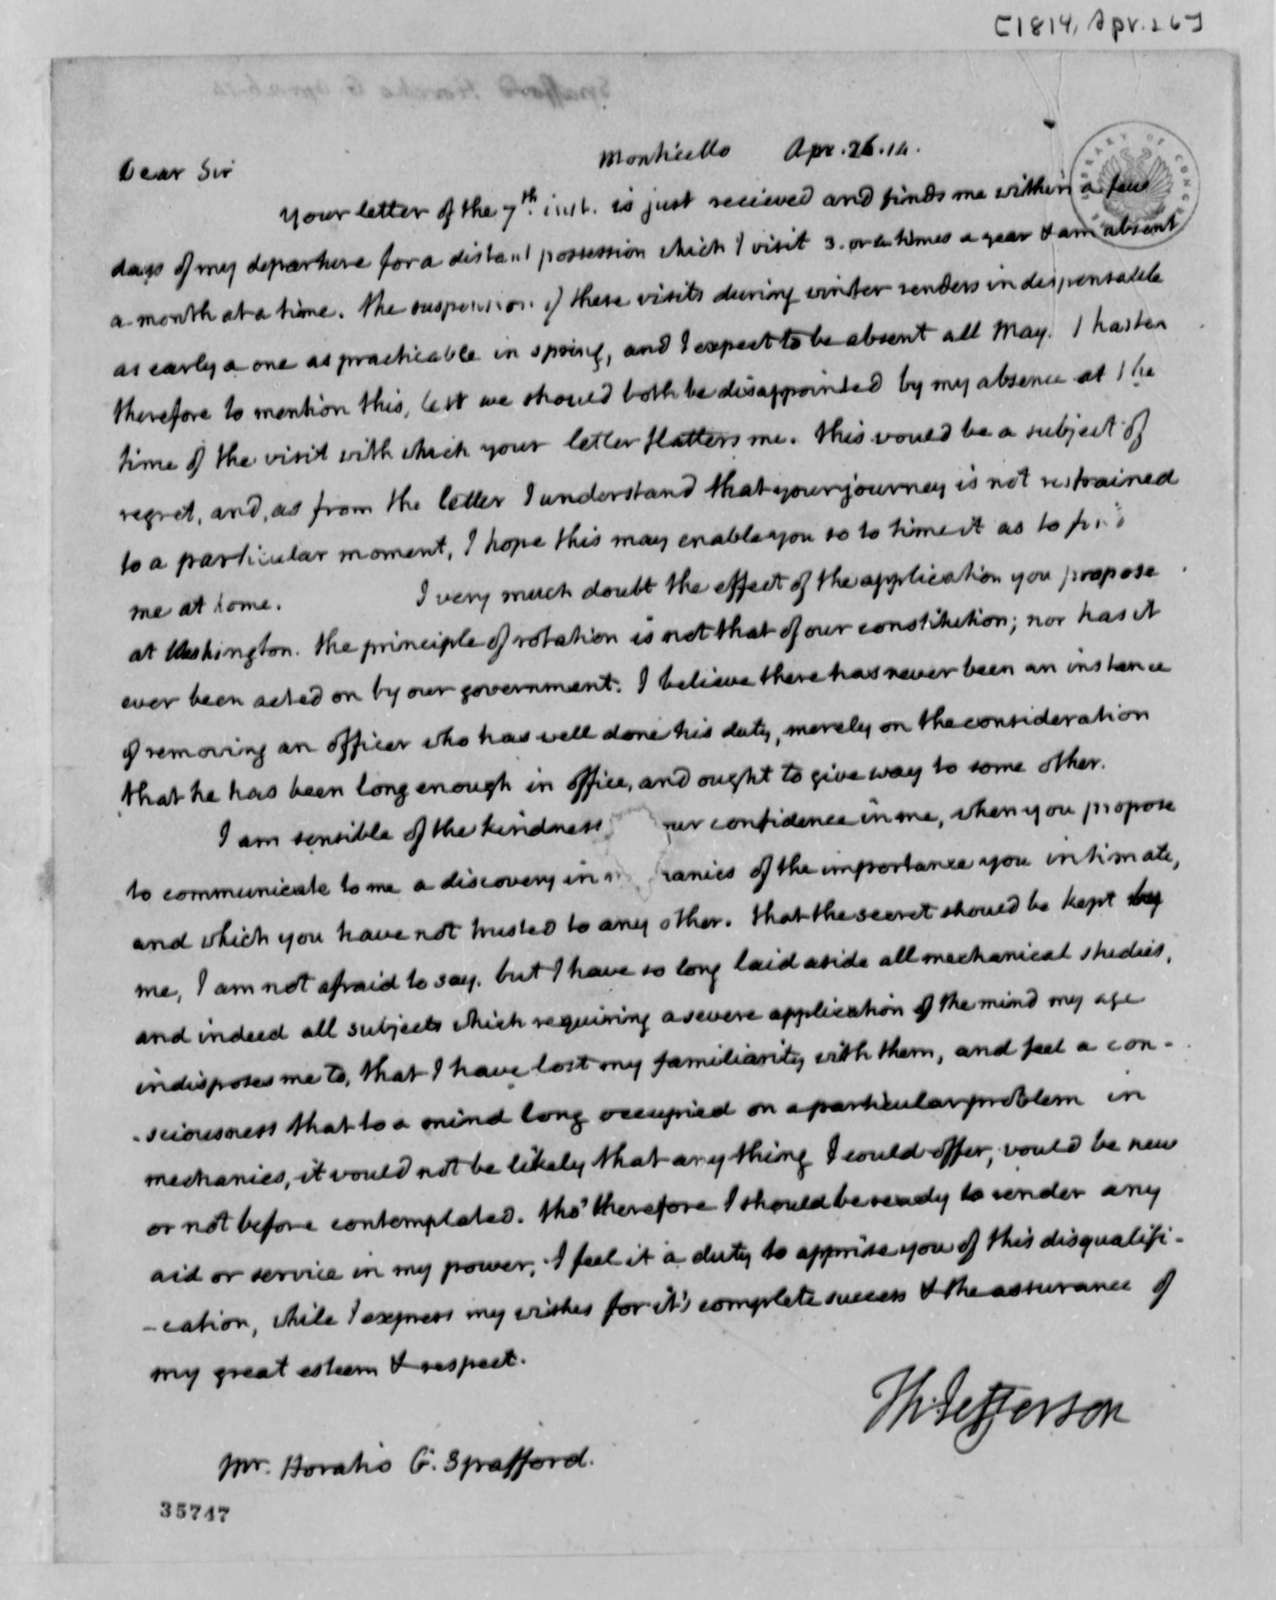 Thomas Jefferson to Horatio G. Spafford, April 26, 1814